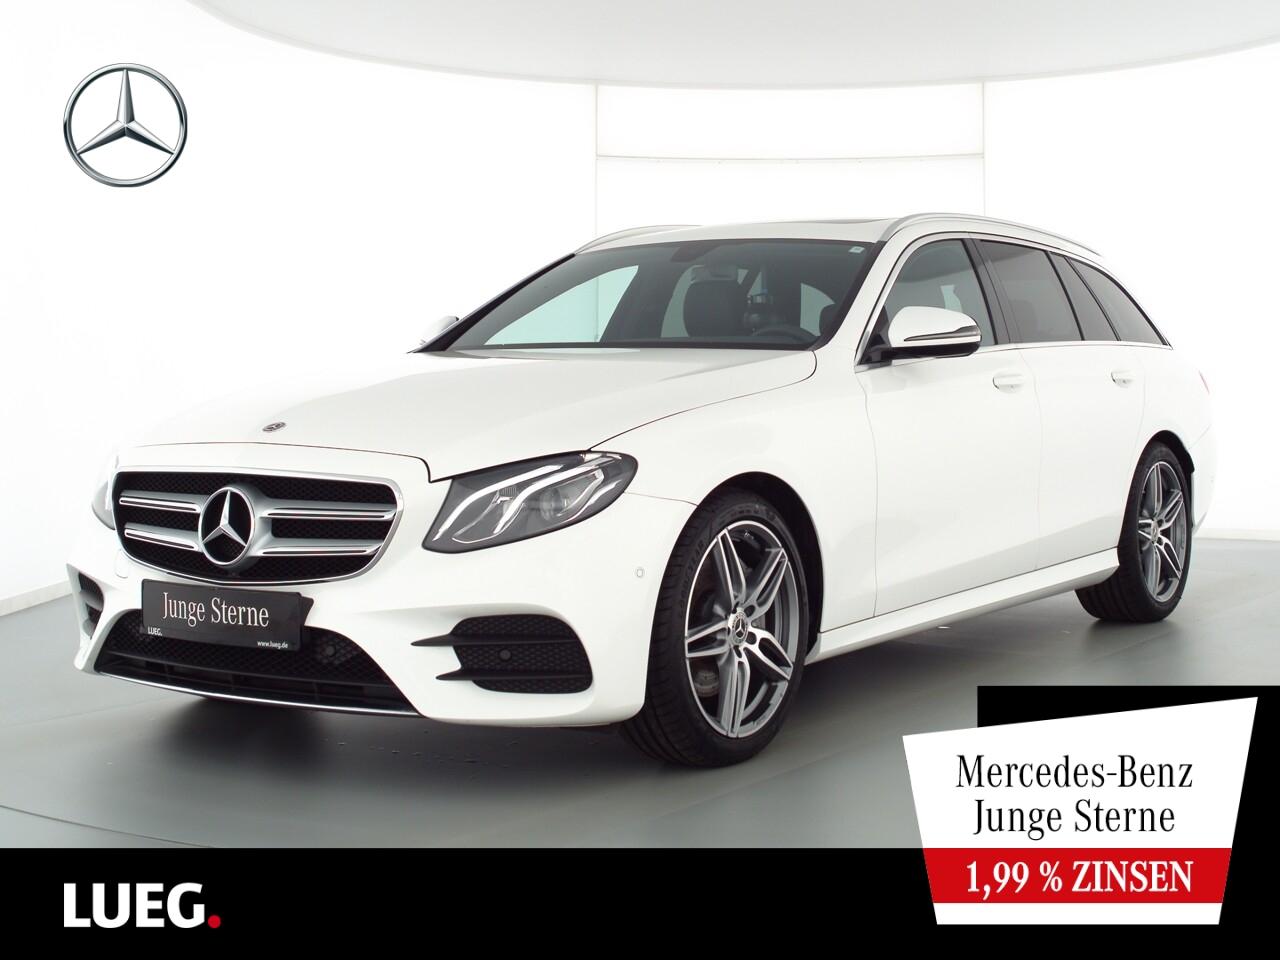 Mercedes-Benz E 300 d T AMG+Navi+SHD+LED-HP+AHK+ParkAss+Kamera, Jahr 2020, Diesel